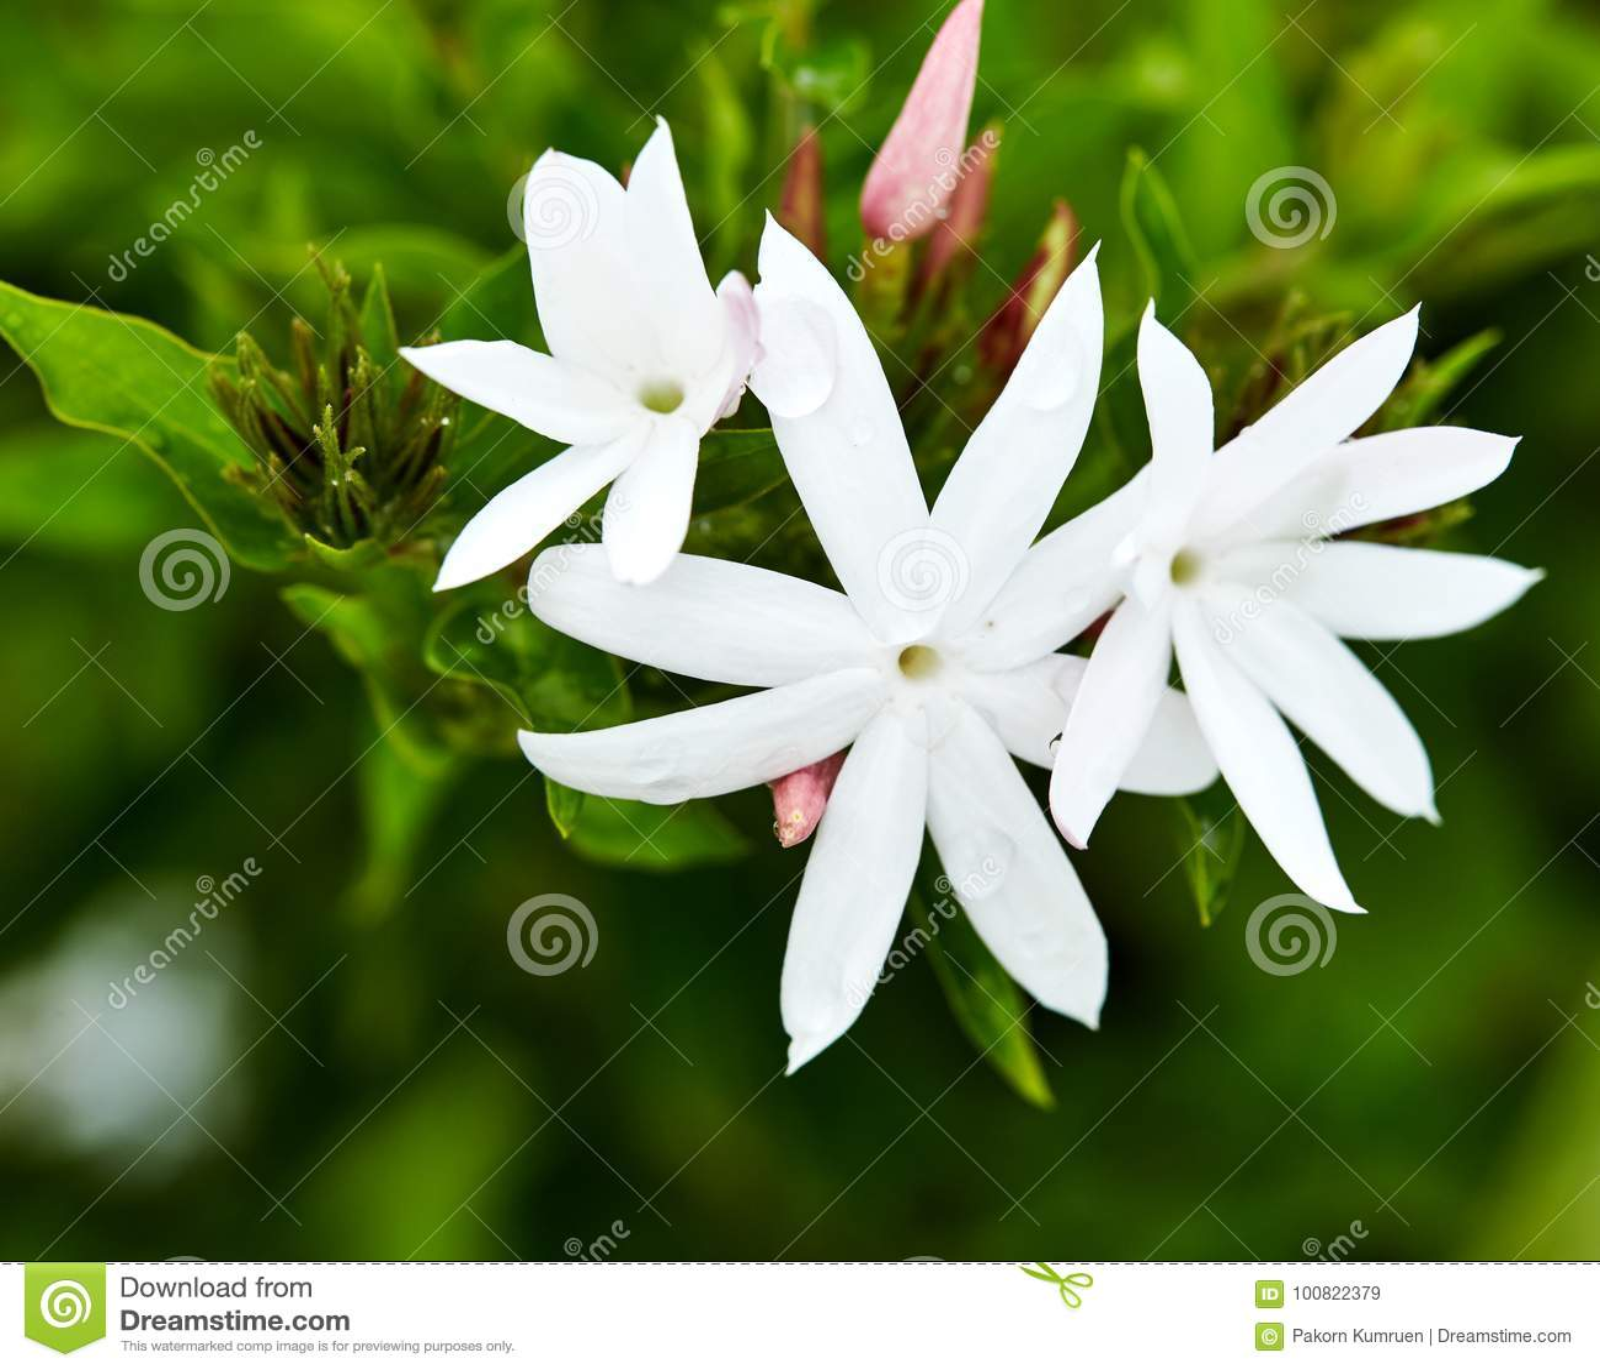 White Star Jasmine In The Garden Stock Image Image Of Close Star